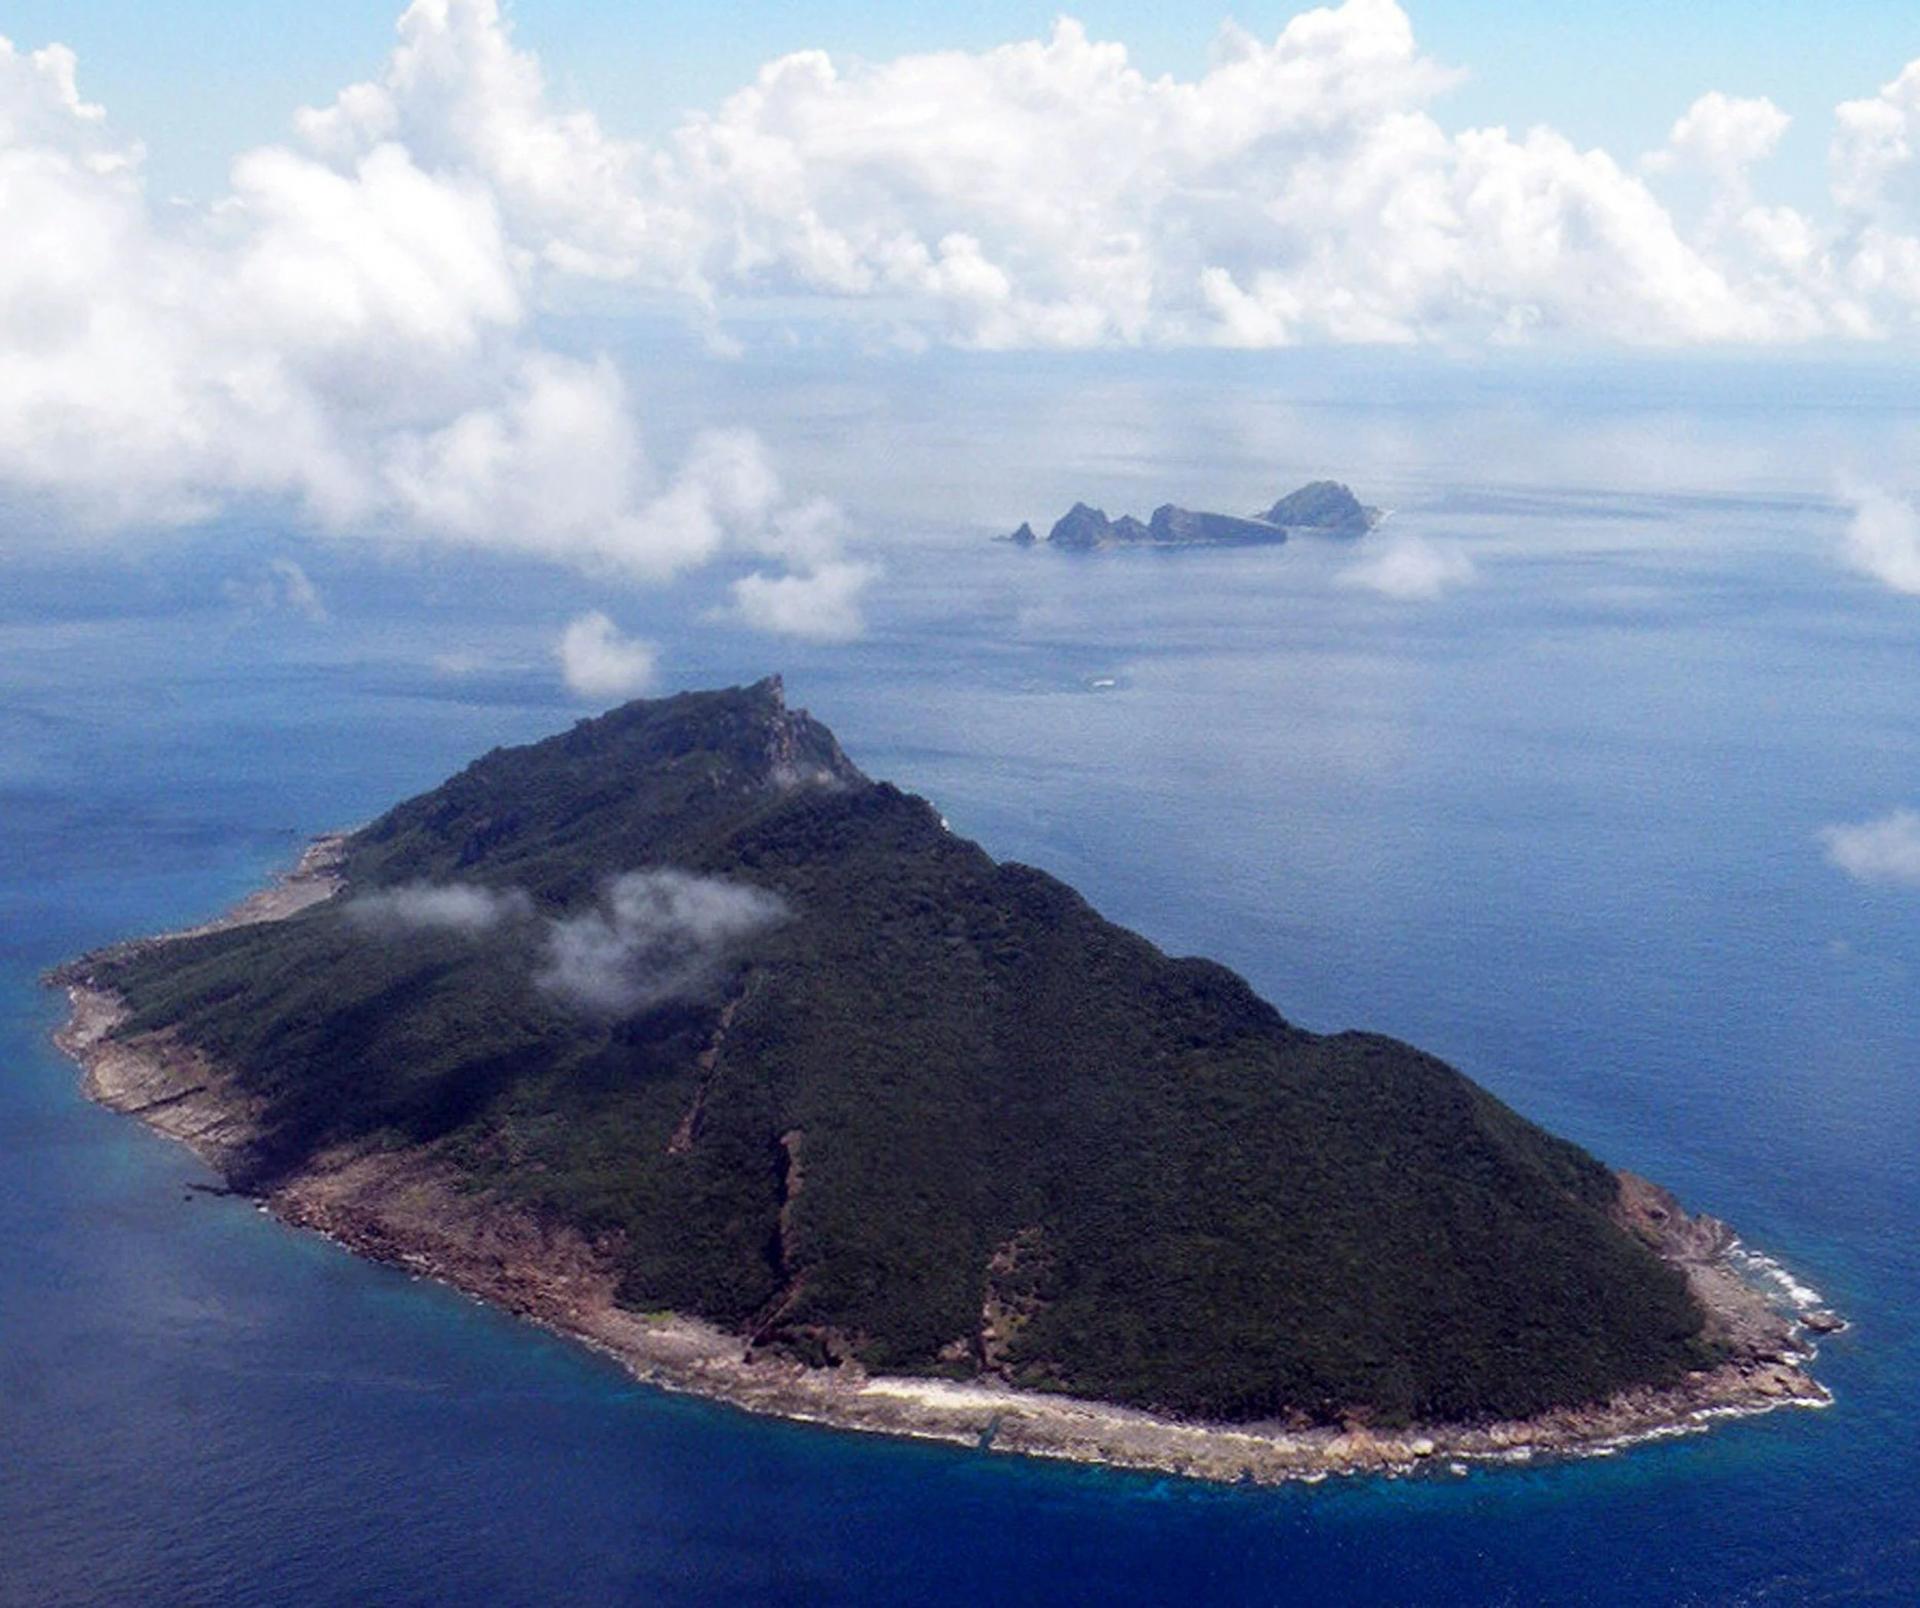 East China Sea: Japan asks China to take down digital museum on disputed island